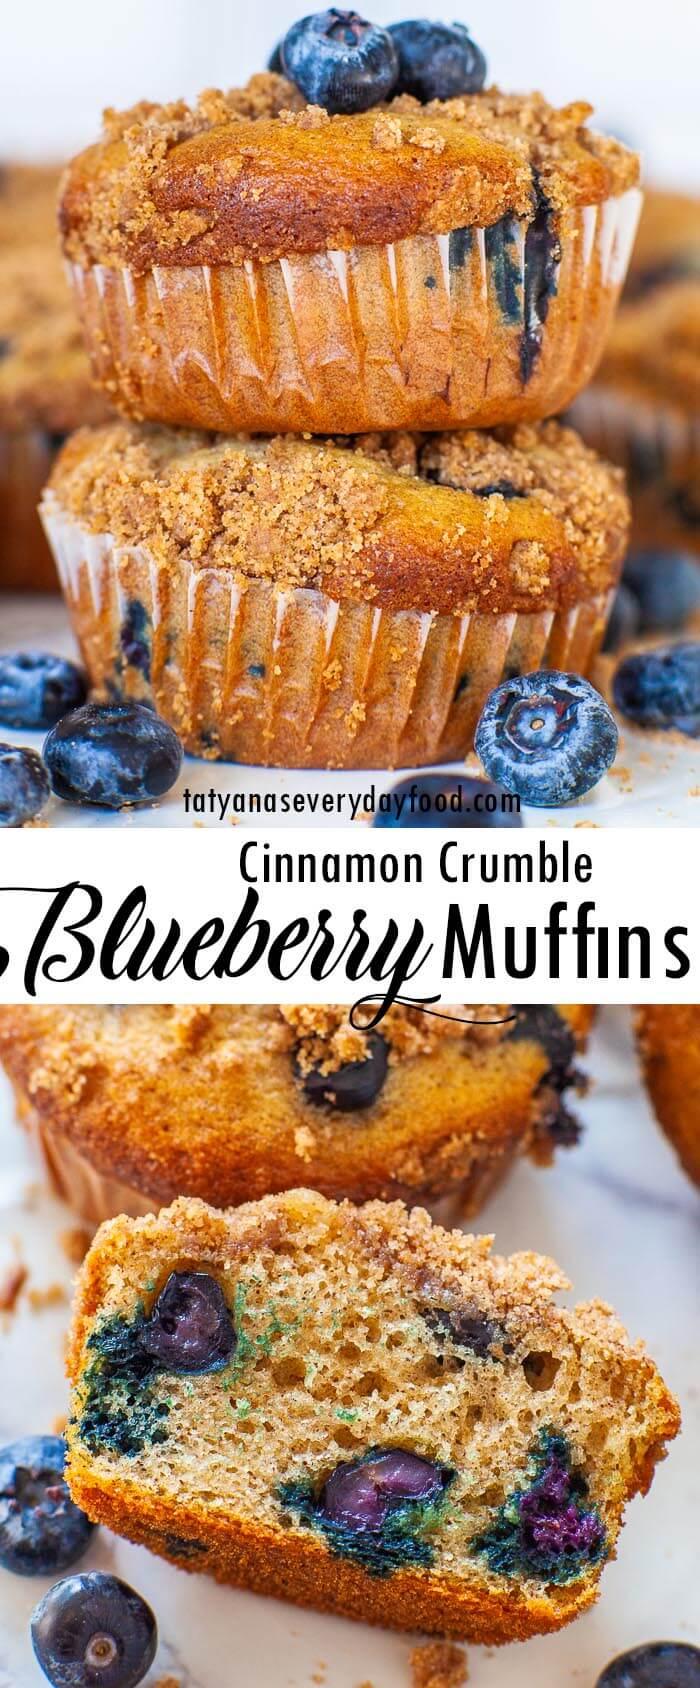 Cinnamon Crumble Blueberry Muffins video recipe